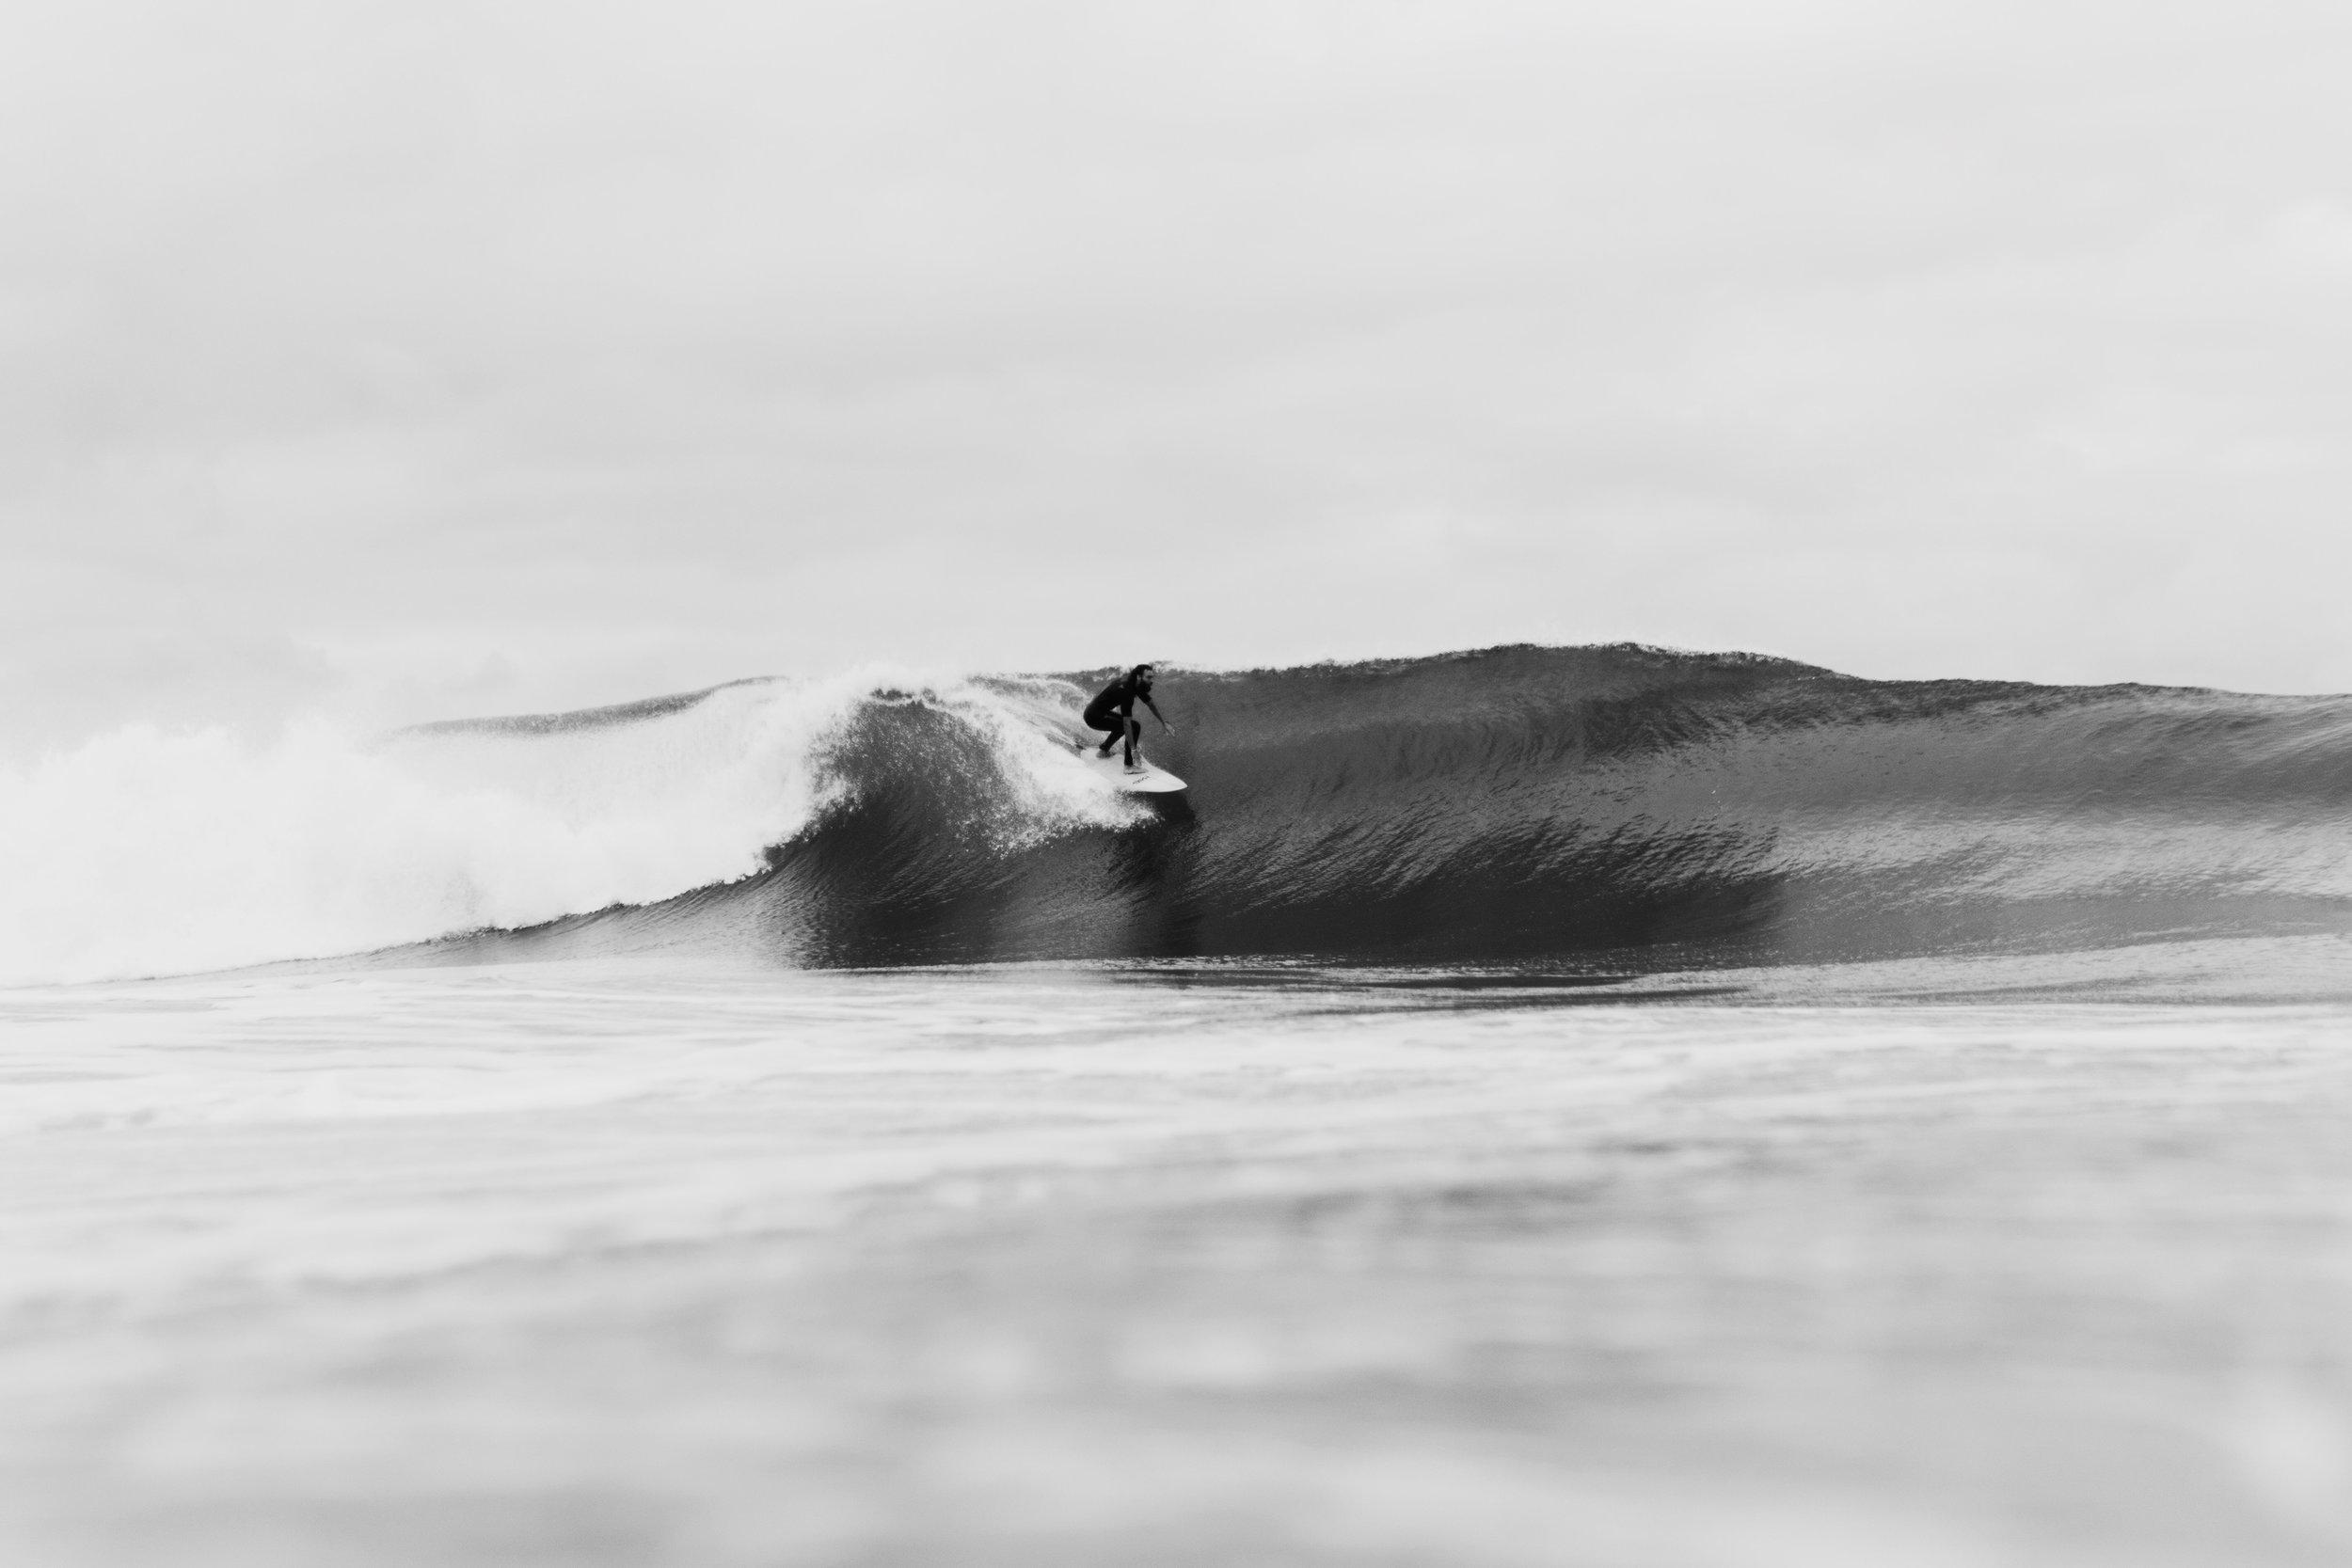 Sayulita-Mexico-Surf-Diego-Cadena-Kalle-Carranza-Dylan-Southworth-Gato-Rodriguez-Julien-Dorian-Gomez-Heiko-Bothe-17.jpg